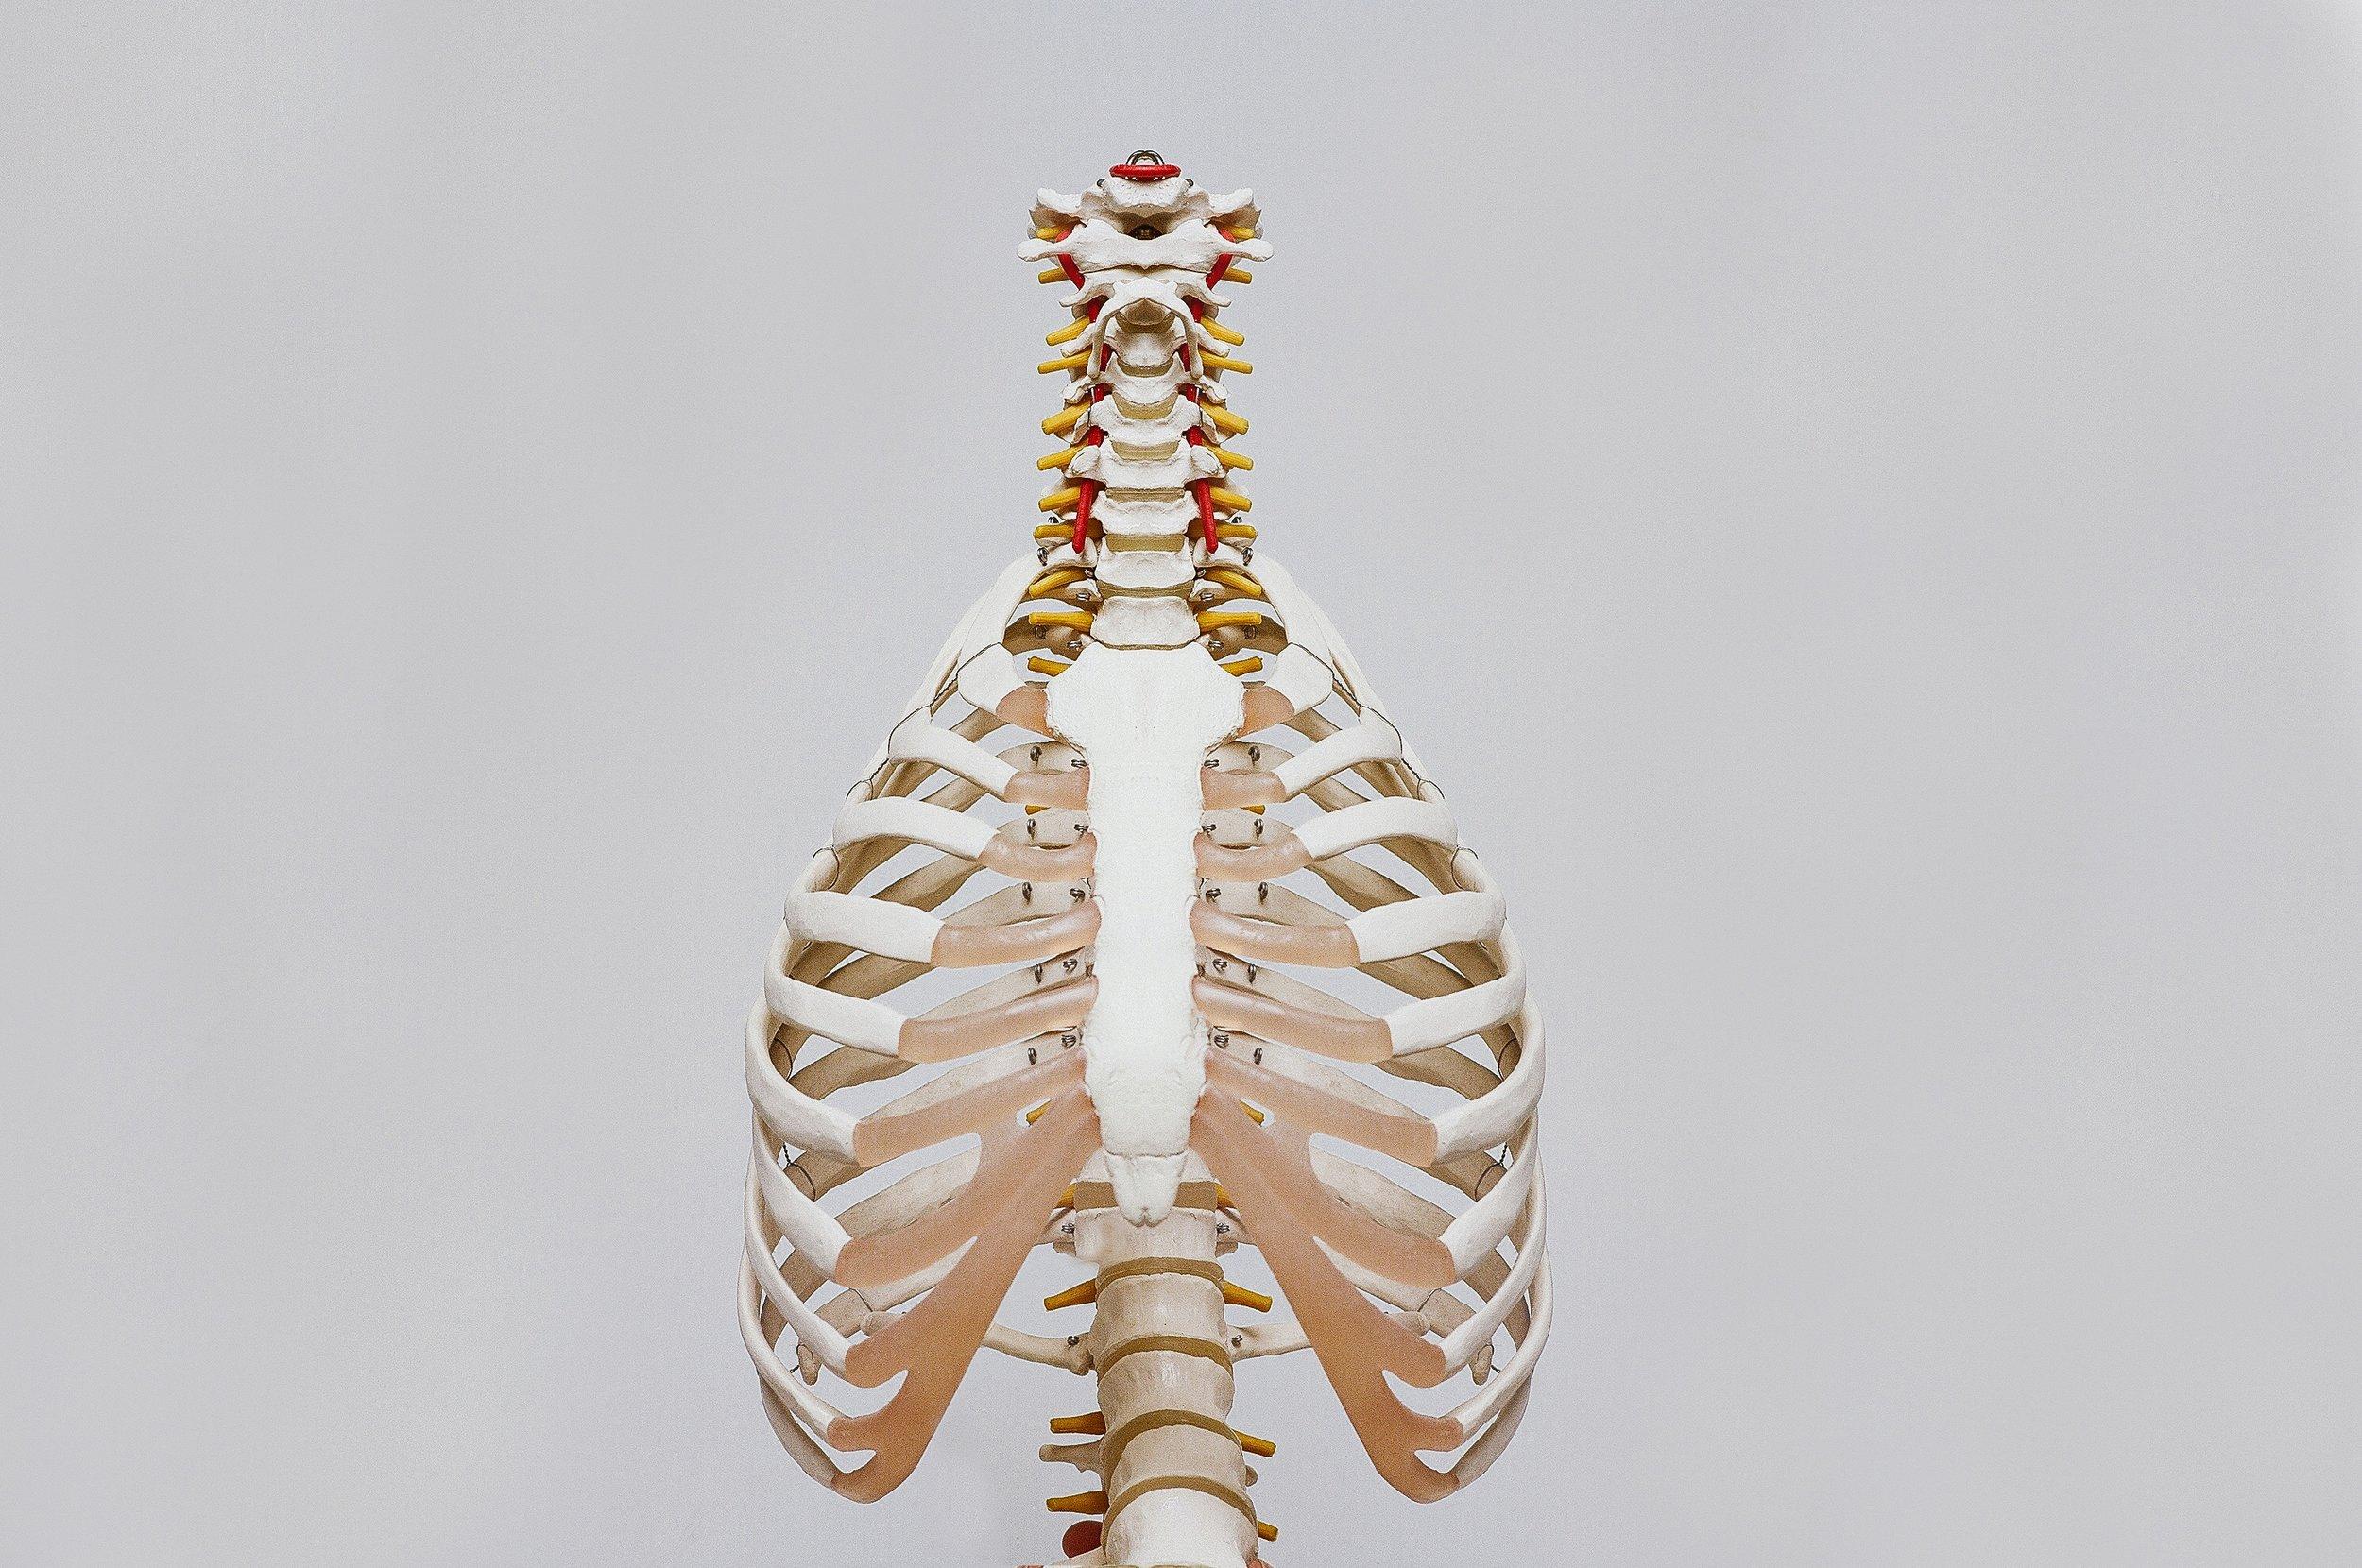 massage-chiropractor-self-care.jpg